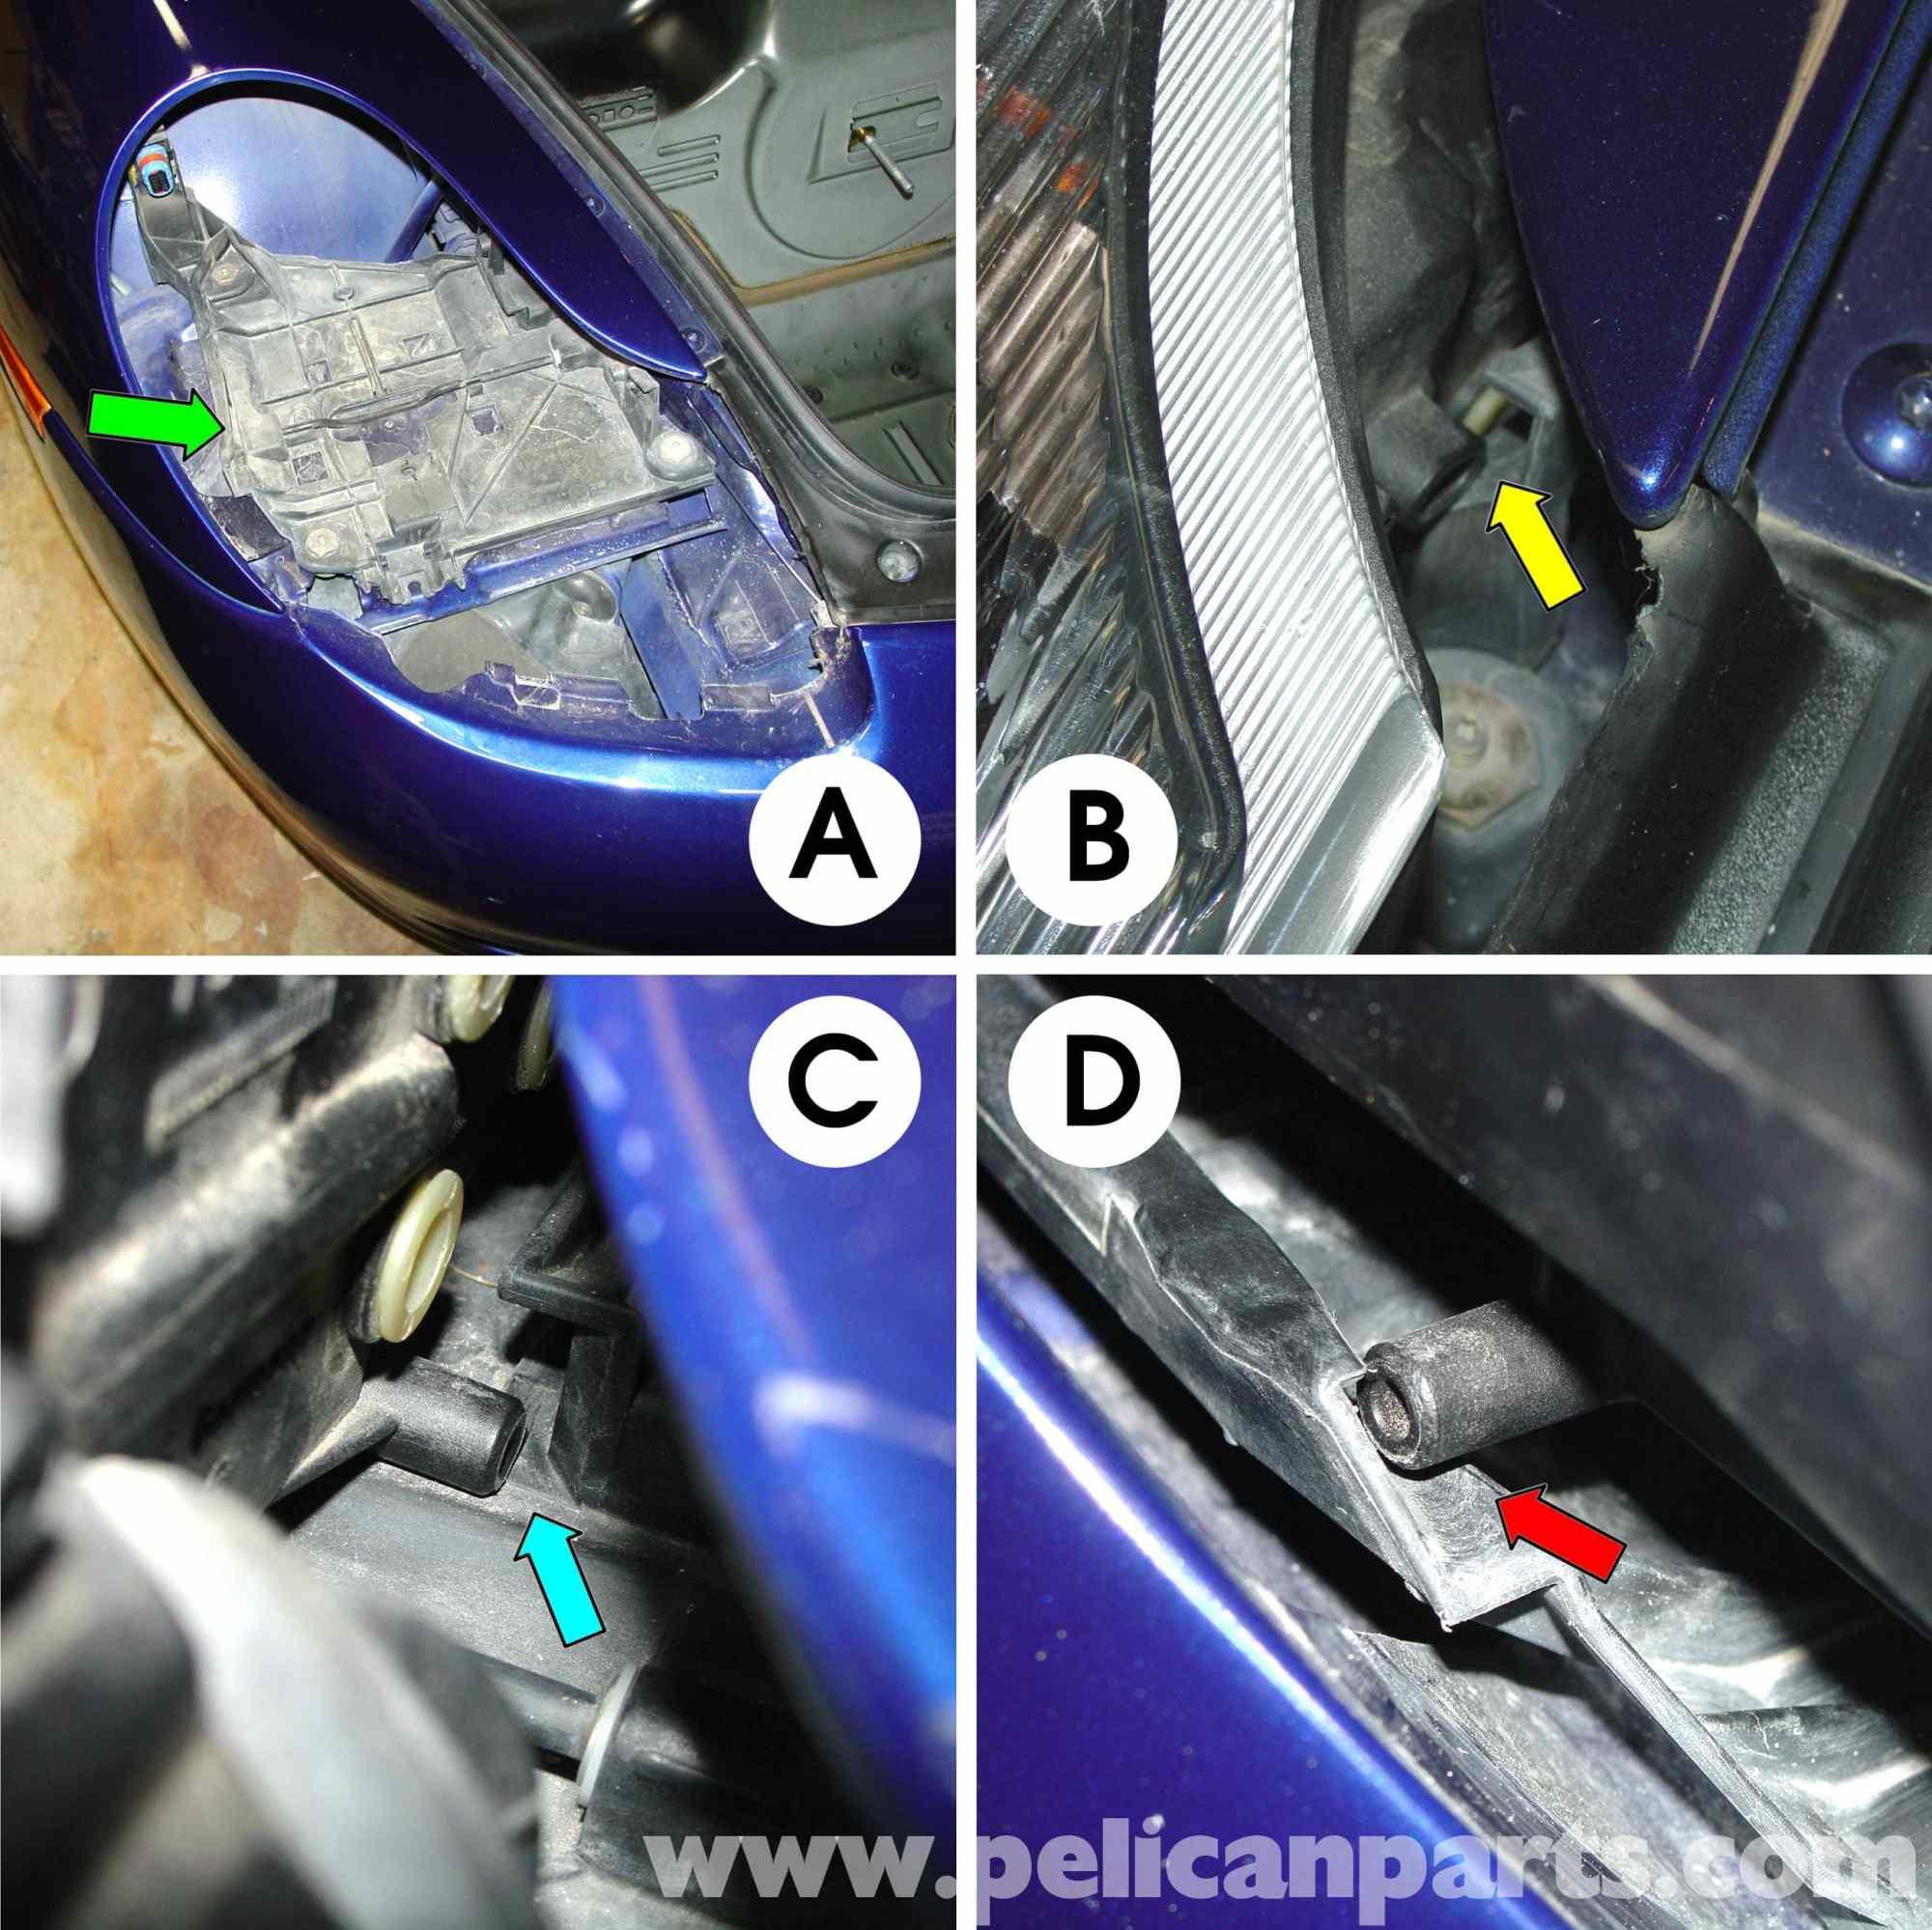 hight resolution of porsche 911 carrera lenses and bulb replacement 996 1998 2005 rh pelicanparts com headlight socket wiring diagram chevy headlight wiring diagram